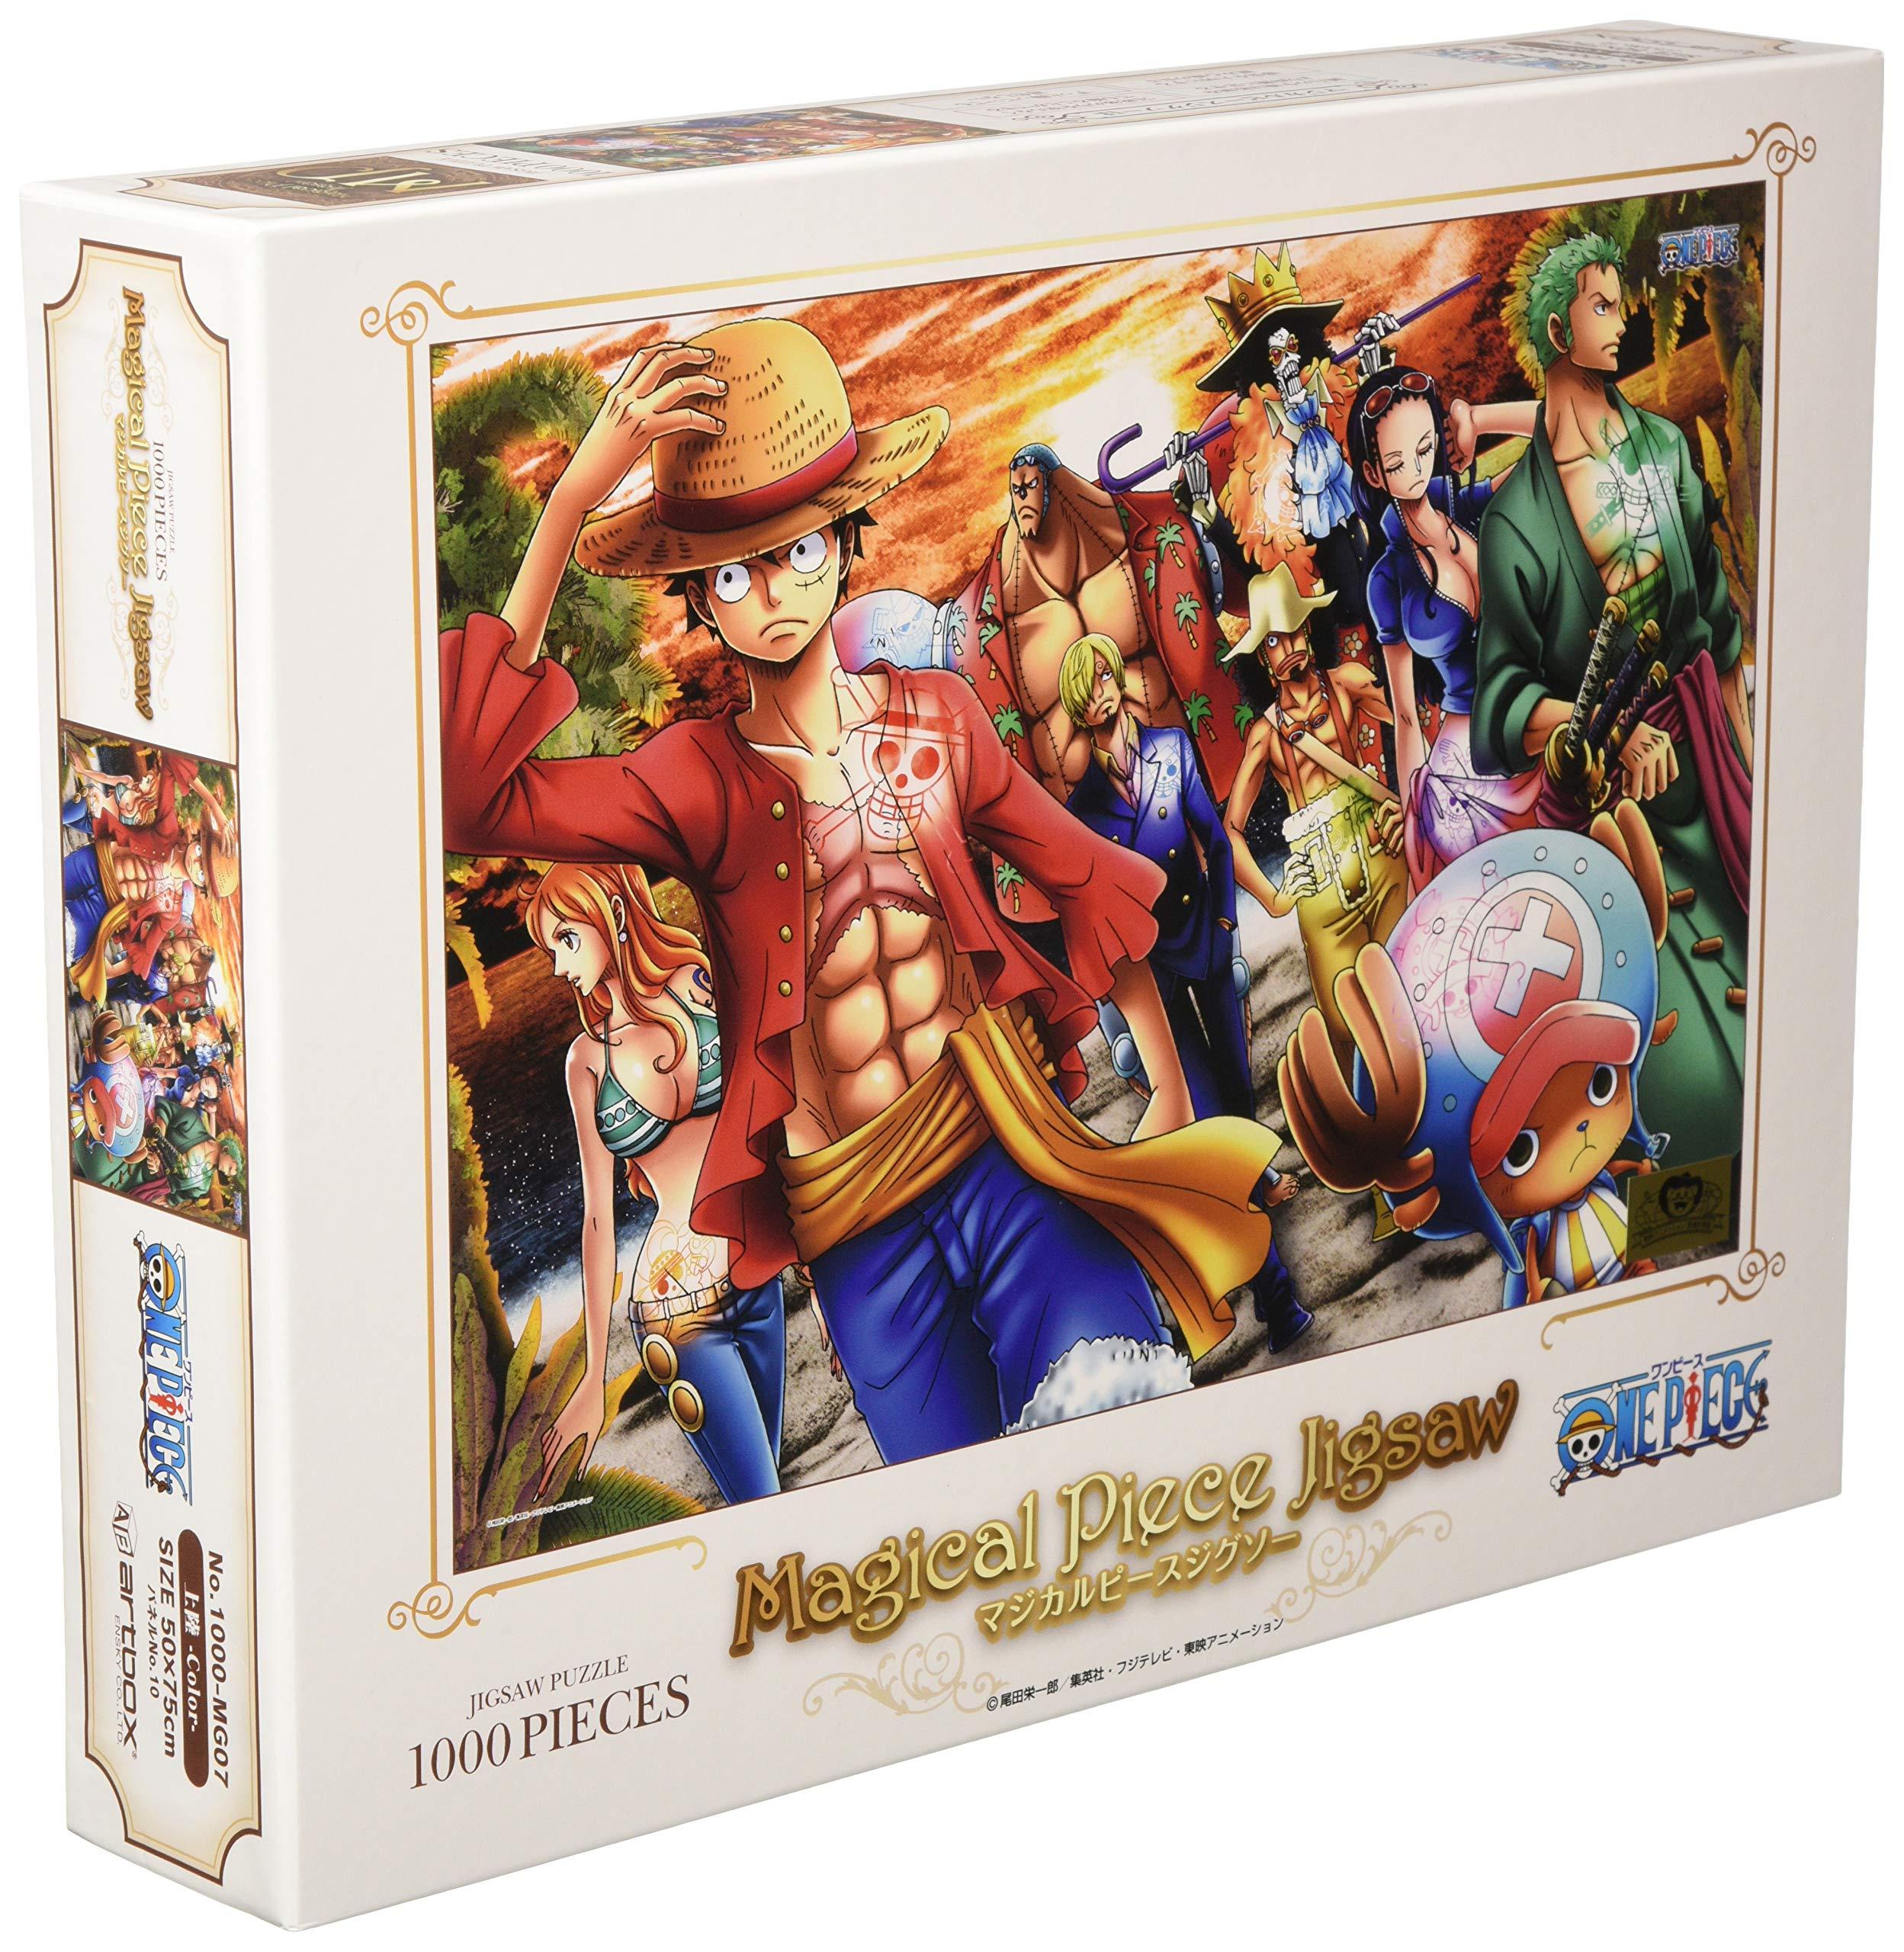 NEW 1000 piece jigsaw puzzle Dragon Ball Z Go Go Paradise 50x75cm from JAPAN